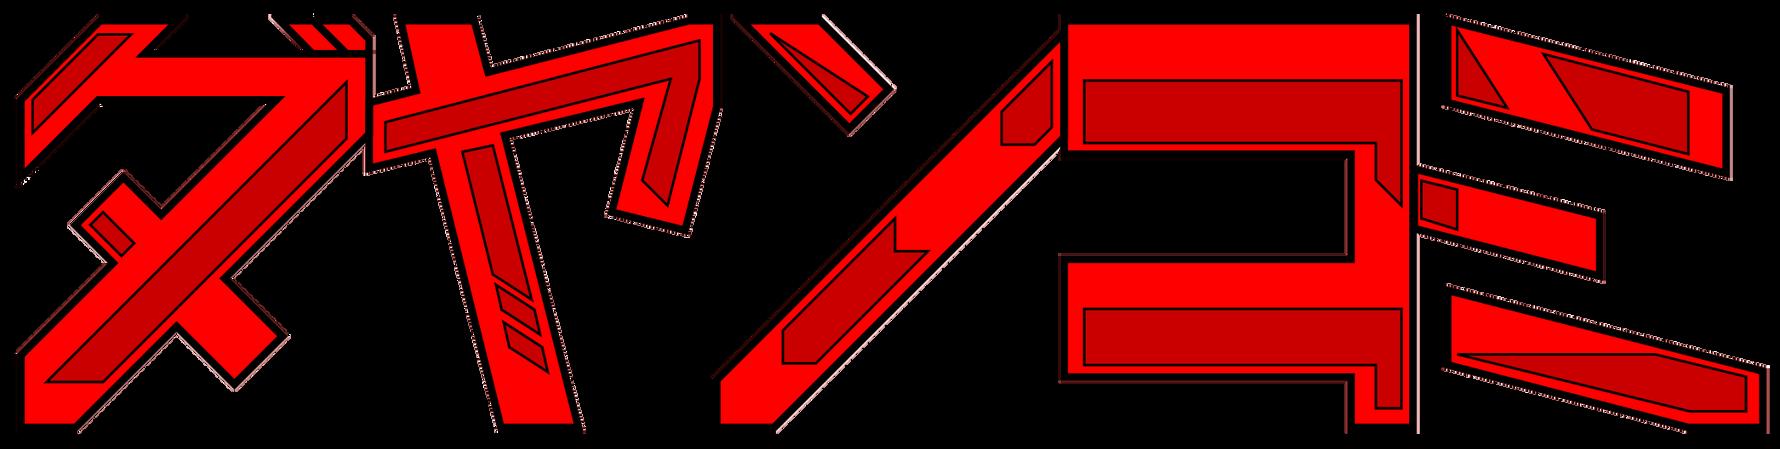 Septiembre - Logo by Darutik